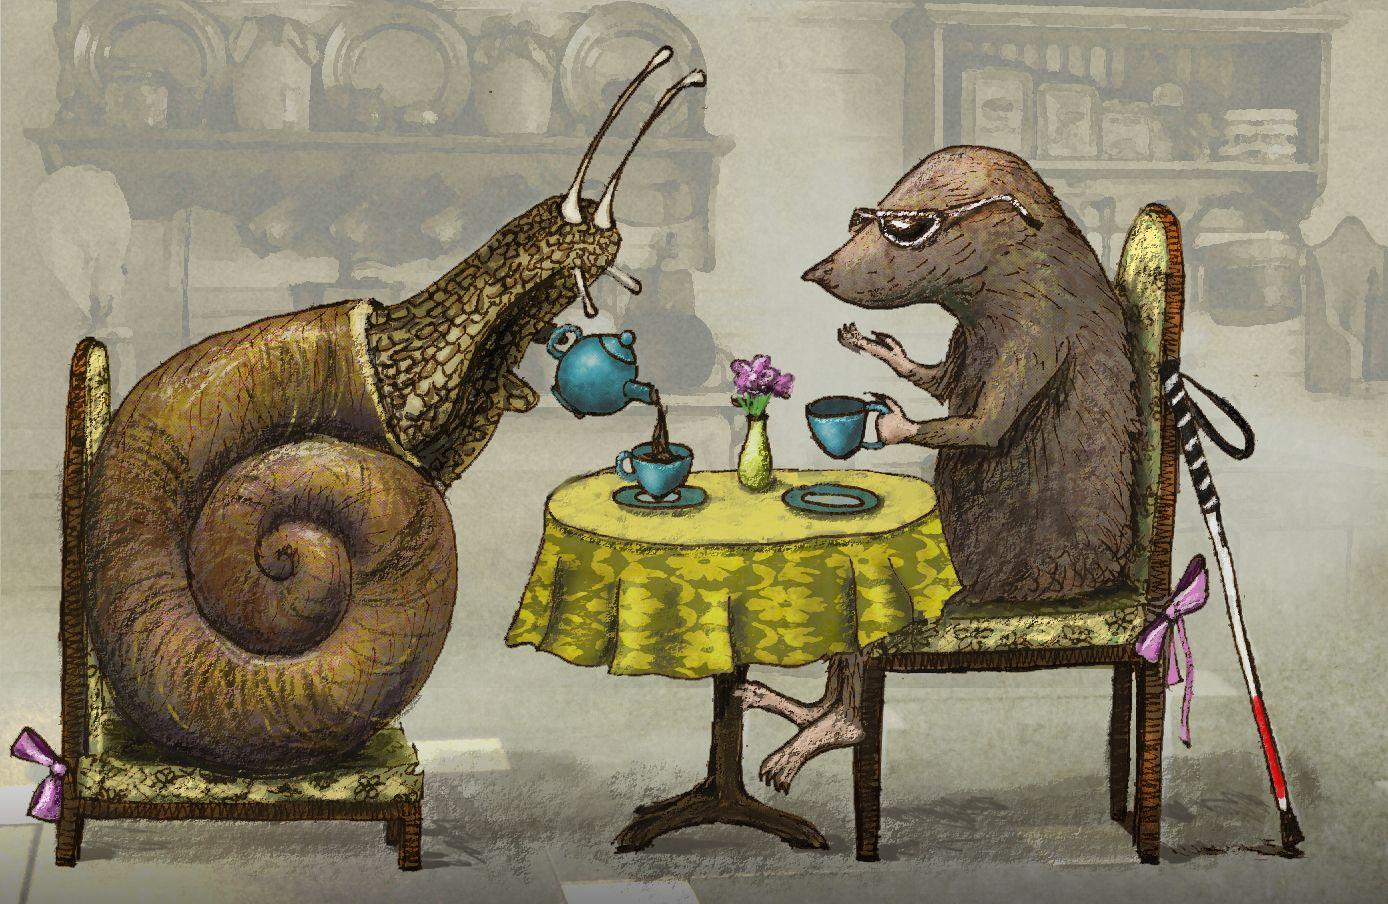 Snail & Mole